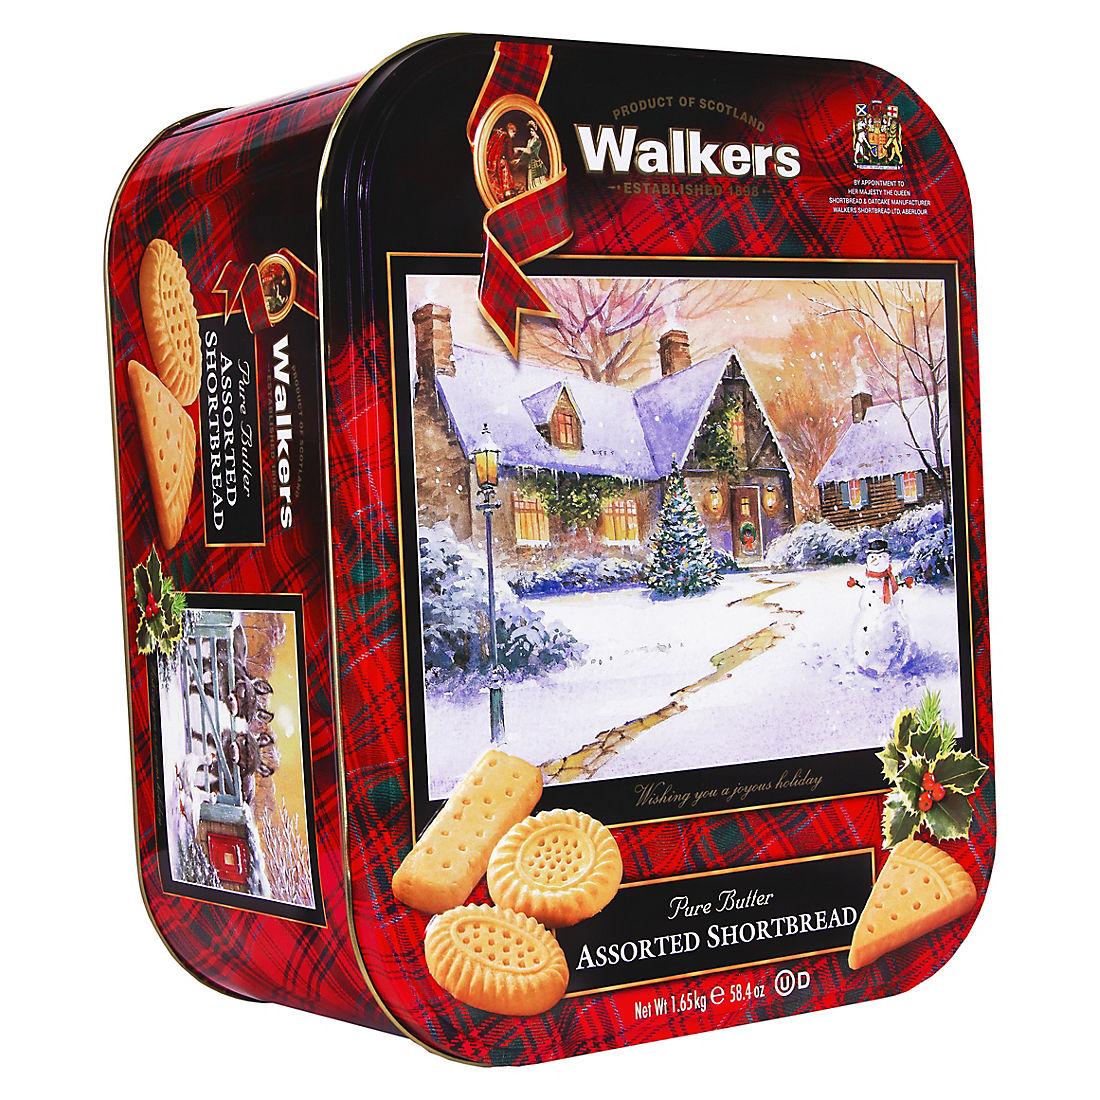 Walkers Pure Butter Shortbread Assortment 58 4 Oz